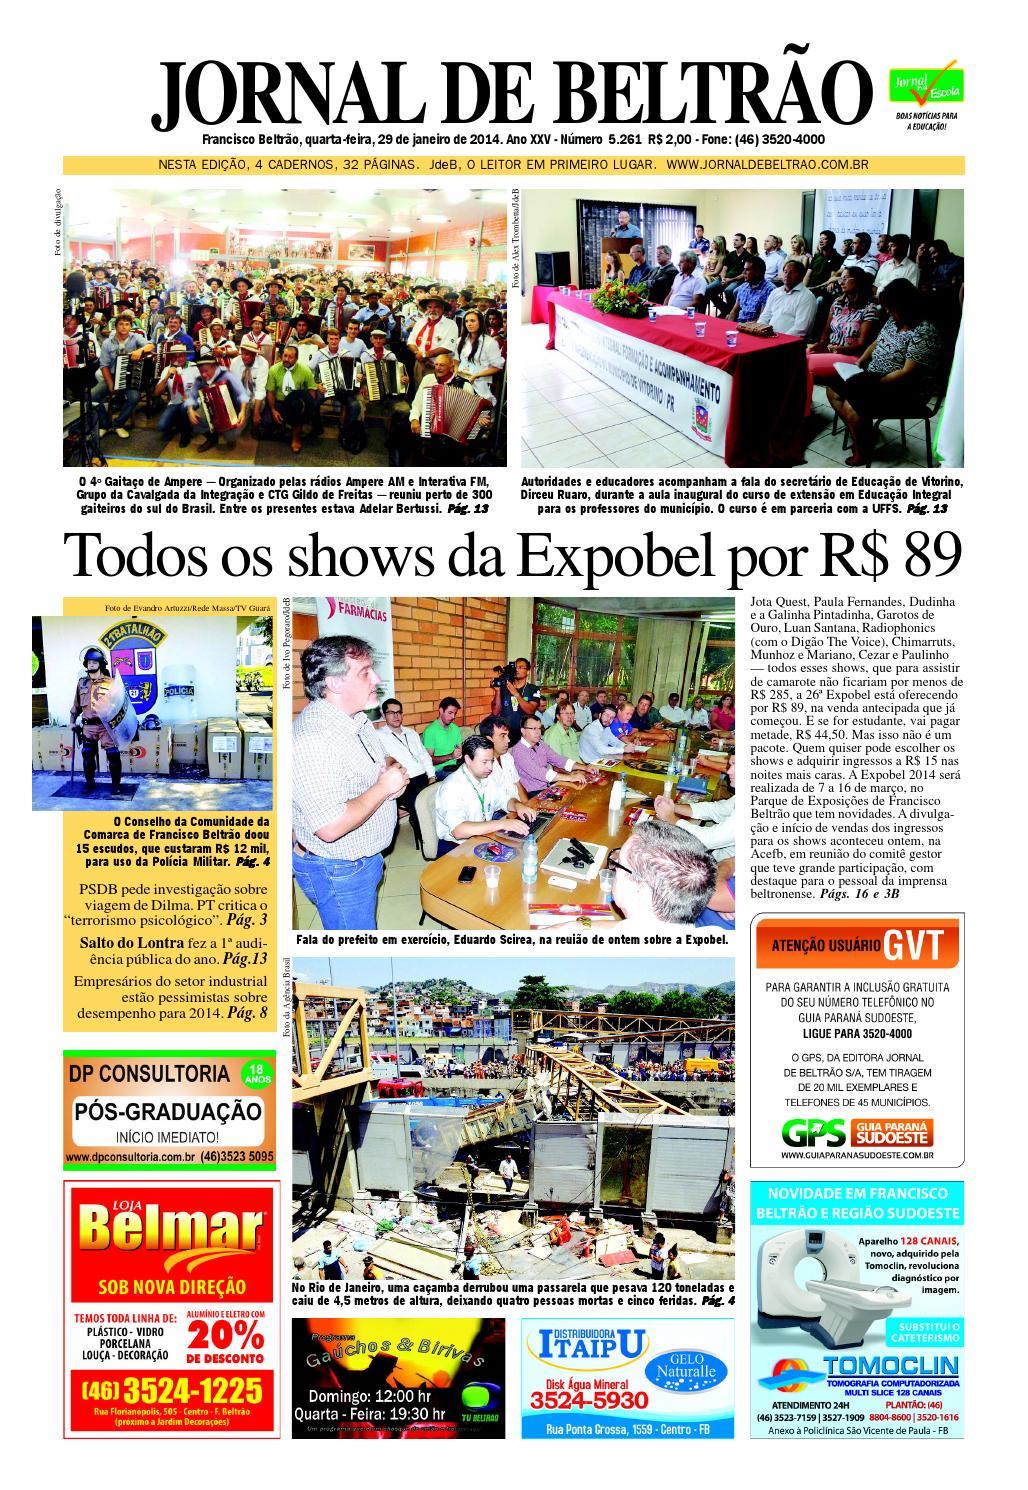 Jornaldebeltrao 5261 29-01-2014.pdf by Orangotoe - issuu 65062da0a699a